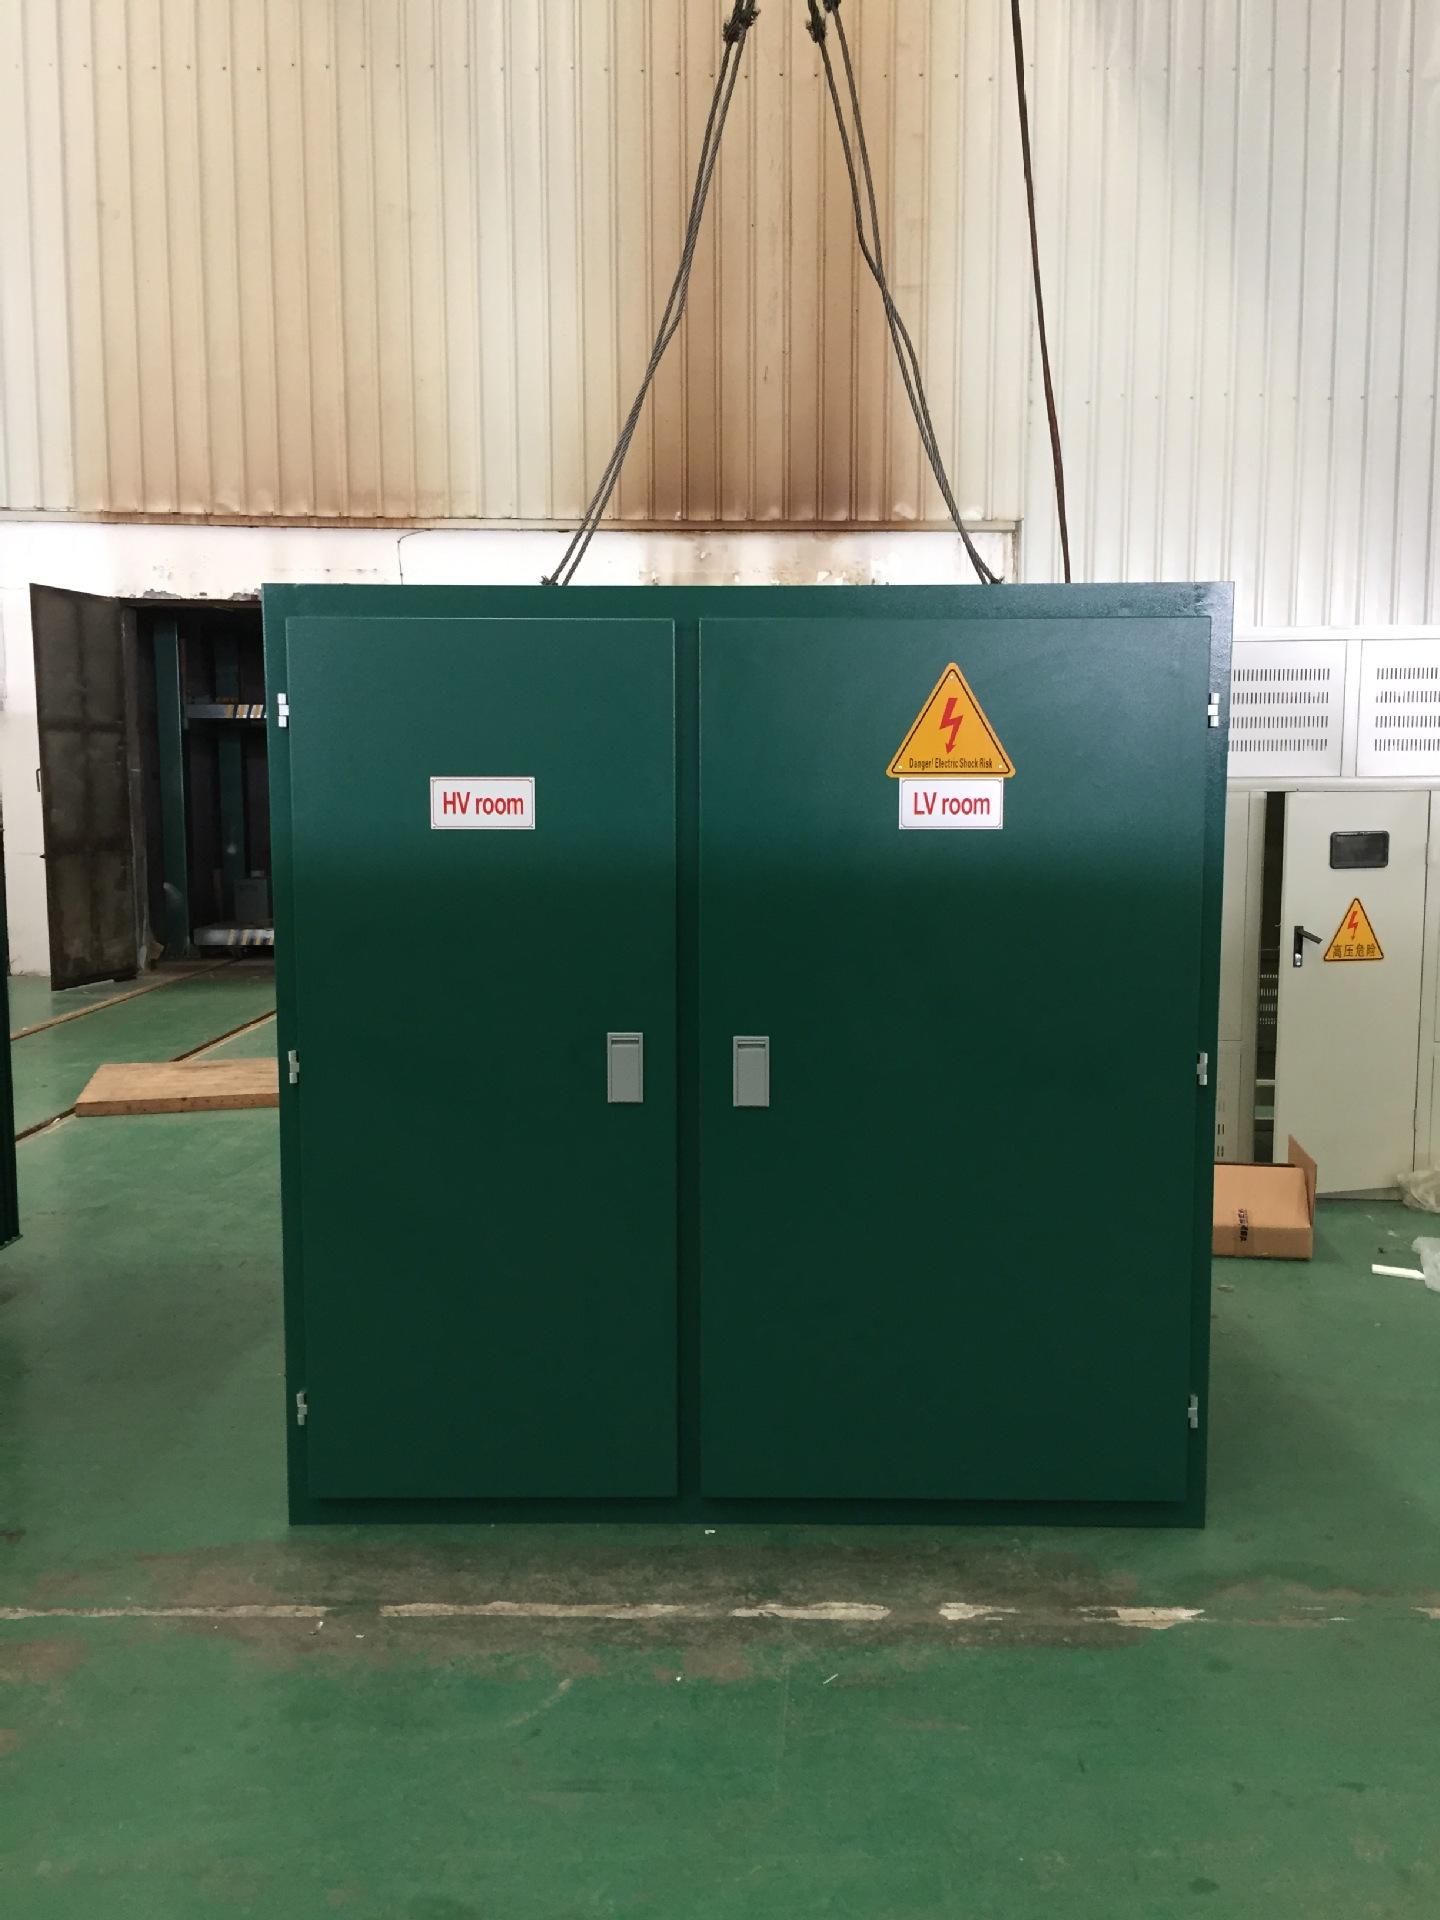 s11-1000kva/10-0.4kv三相油浸式电力箱式变压器光伏变压器风电变